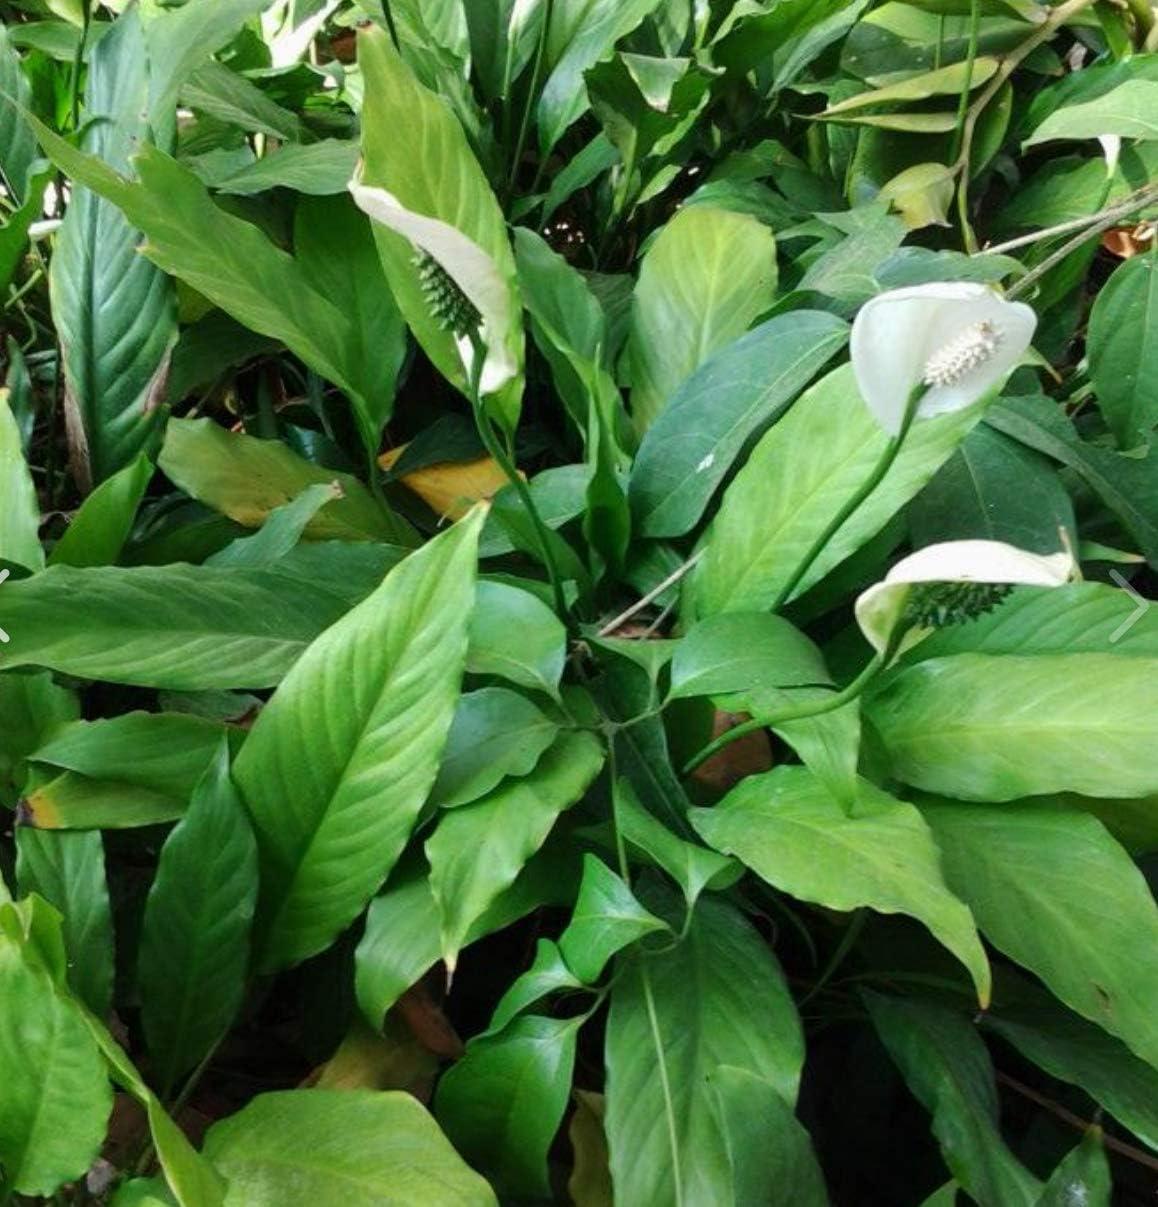 Greenpro Spathiphyllum Wallisii 3-Pack Peace Lily Live Semi-Aquatic Plants for Terrarium Paludarium Easy Setup